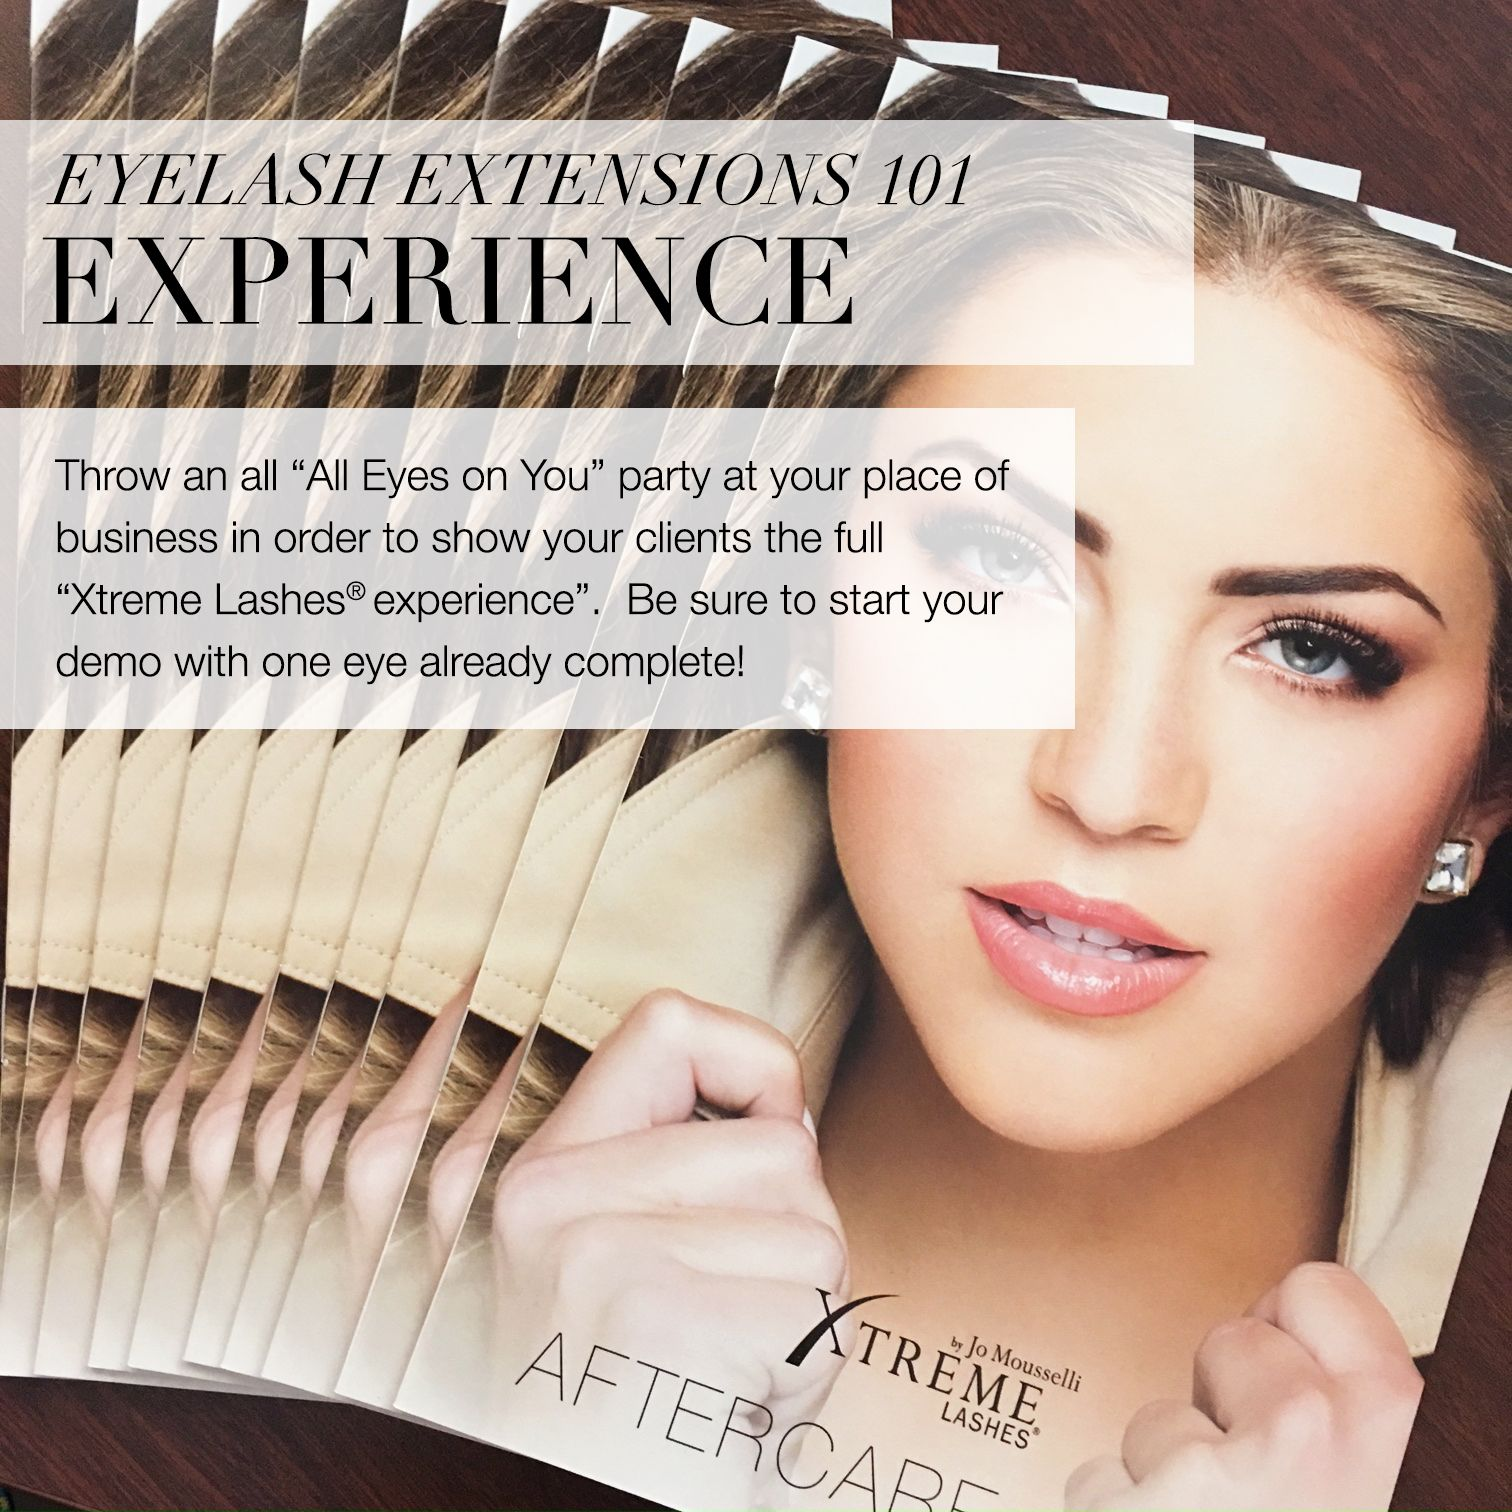 Xtreme Lash Stylists 101 #101 | All Things Eyelash